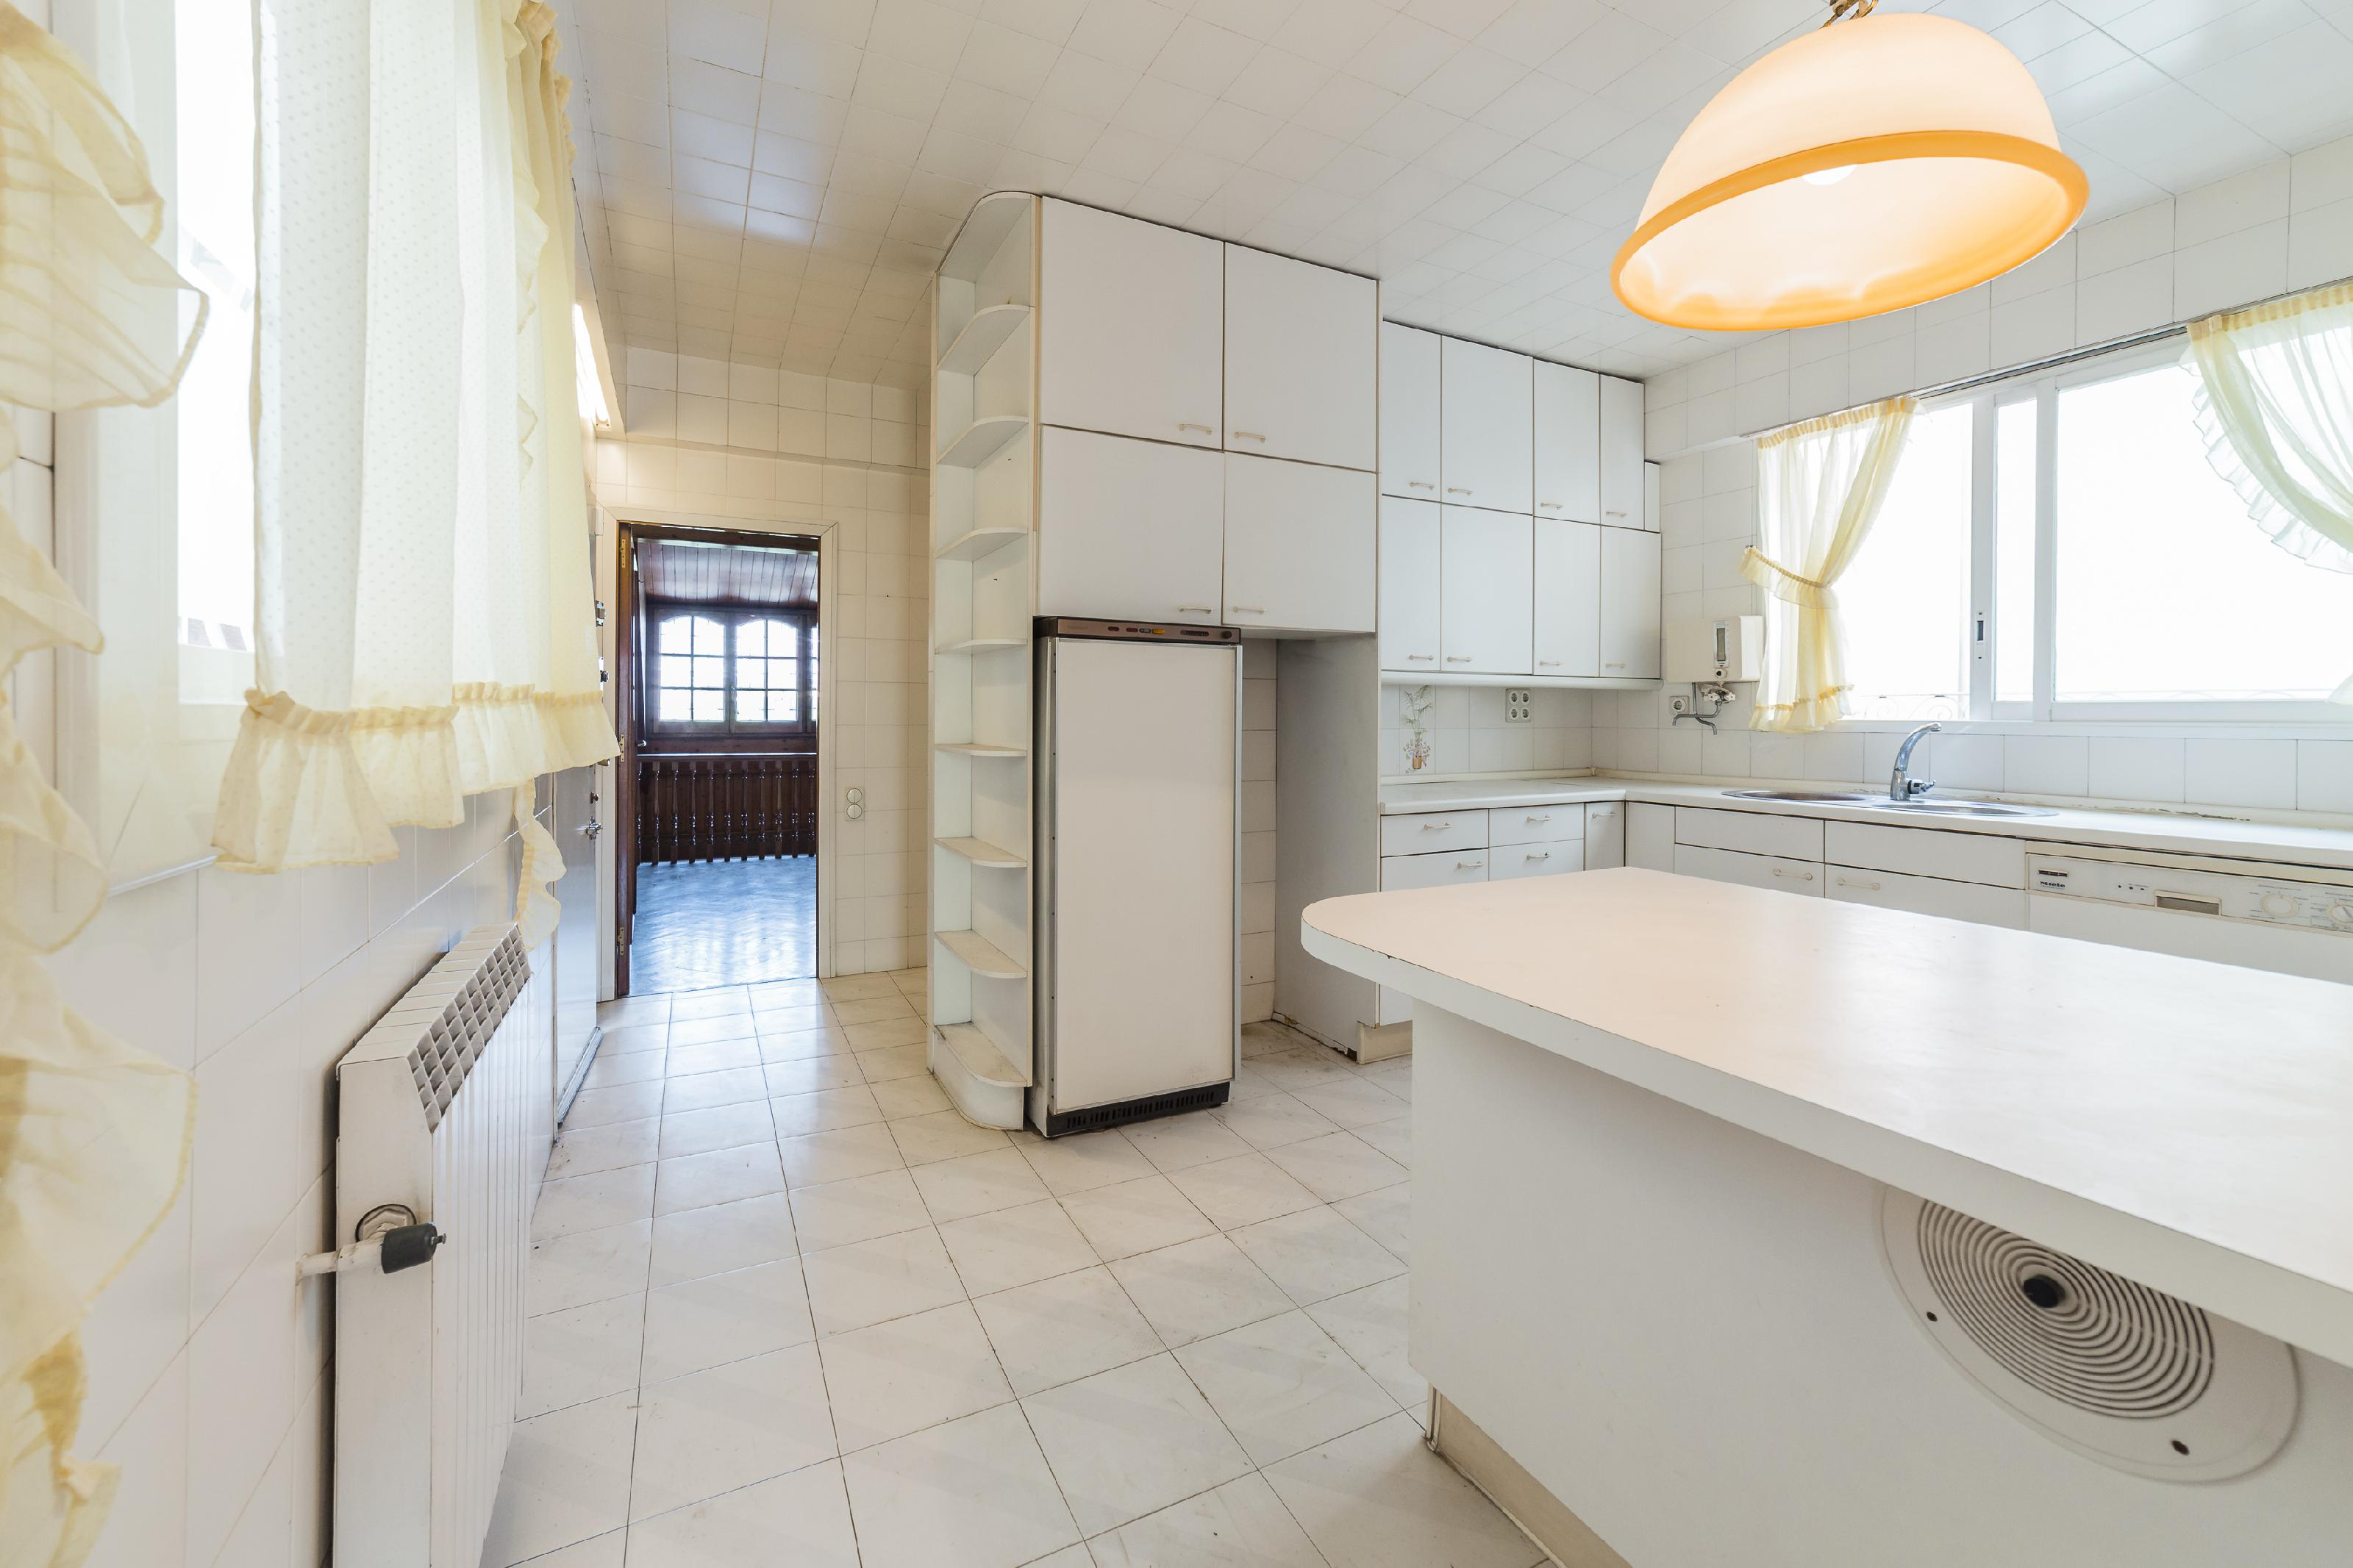 249314 Penthouse for sale in Sarrià-Sant Gervasi, Sant Gervasi-Galvany 16